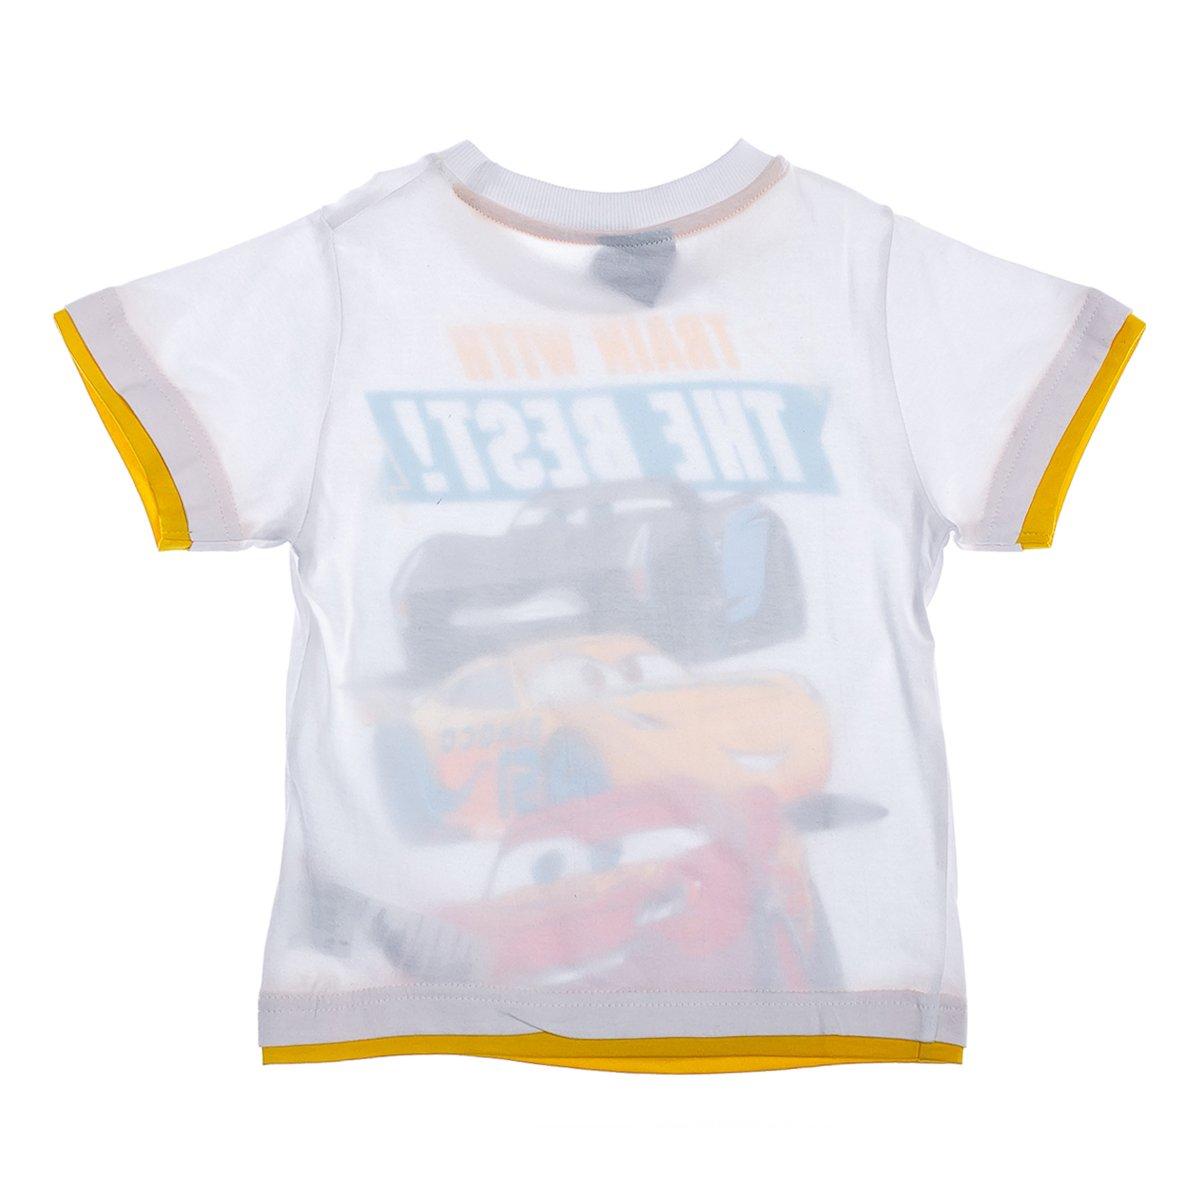 Купить Футболки, майки, топы, туники, Футболка E Plus M Cars The Best White, р. 104 DISC52026412 ТМ: E Plus M, белый